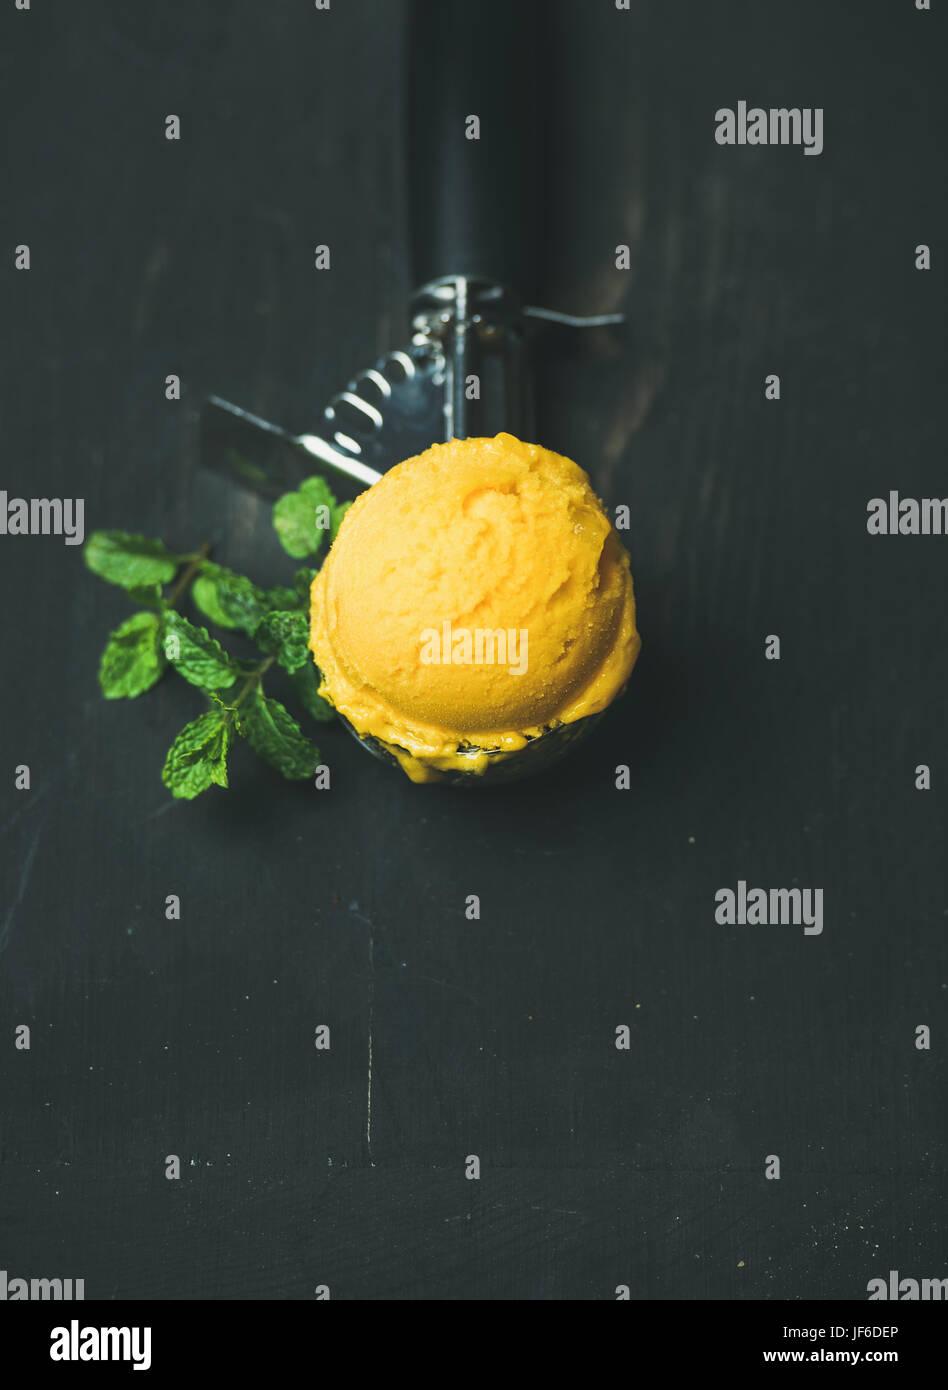 Mango sorbet ice cream scoop in ice cream scooper - Stock Image